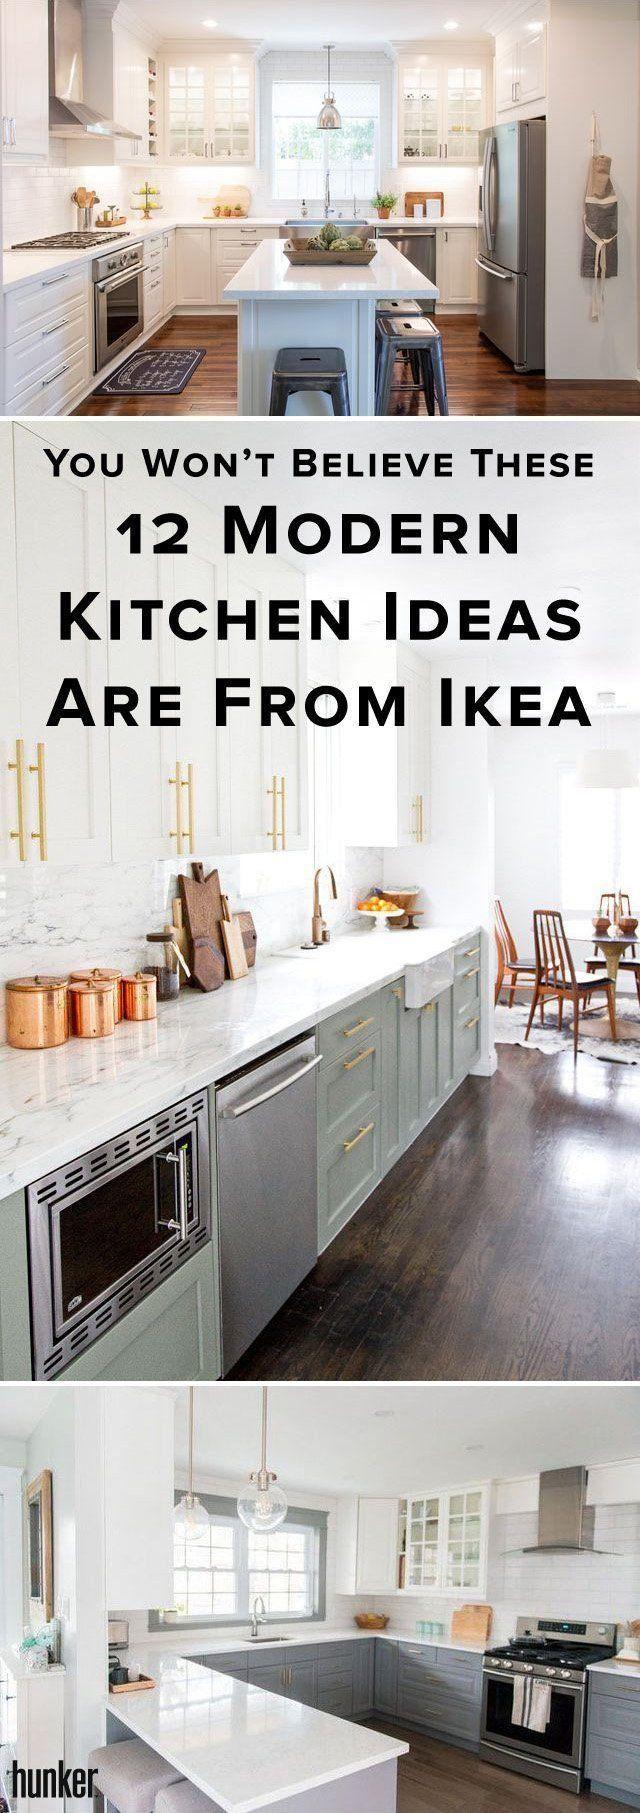 103 best Kitchen Essentials and Decor images on Pinterest ...